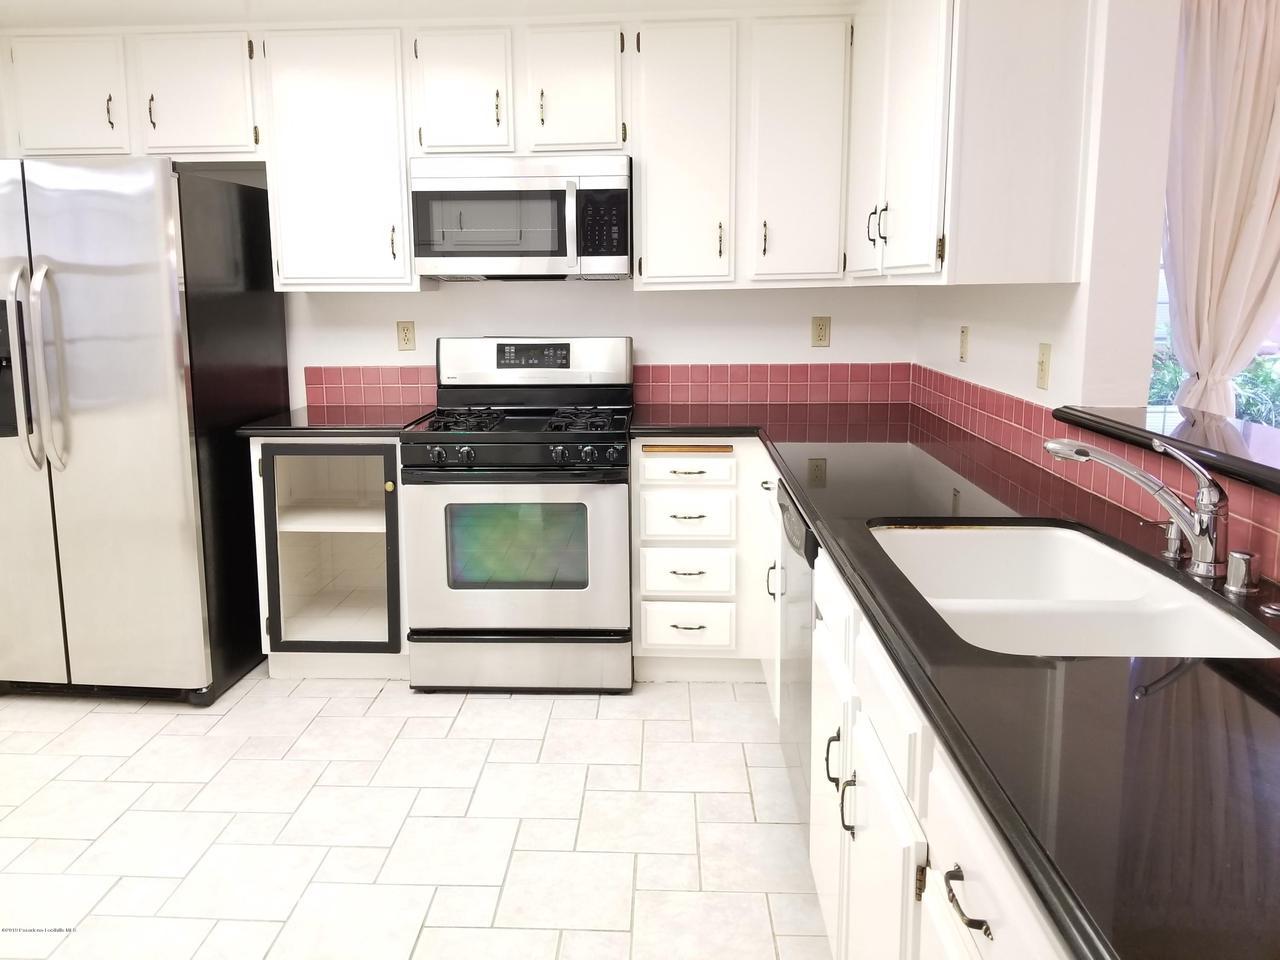 124 MONTEREY, South Pasadena, CA 91030 - Kitchen